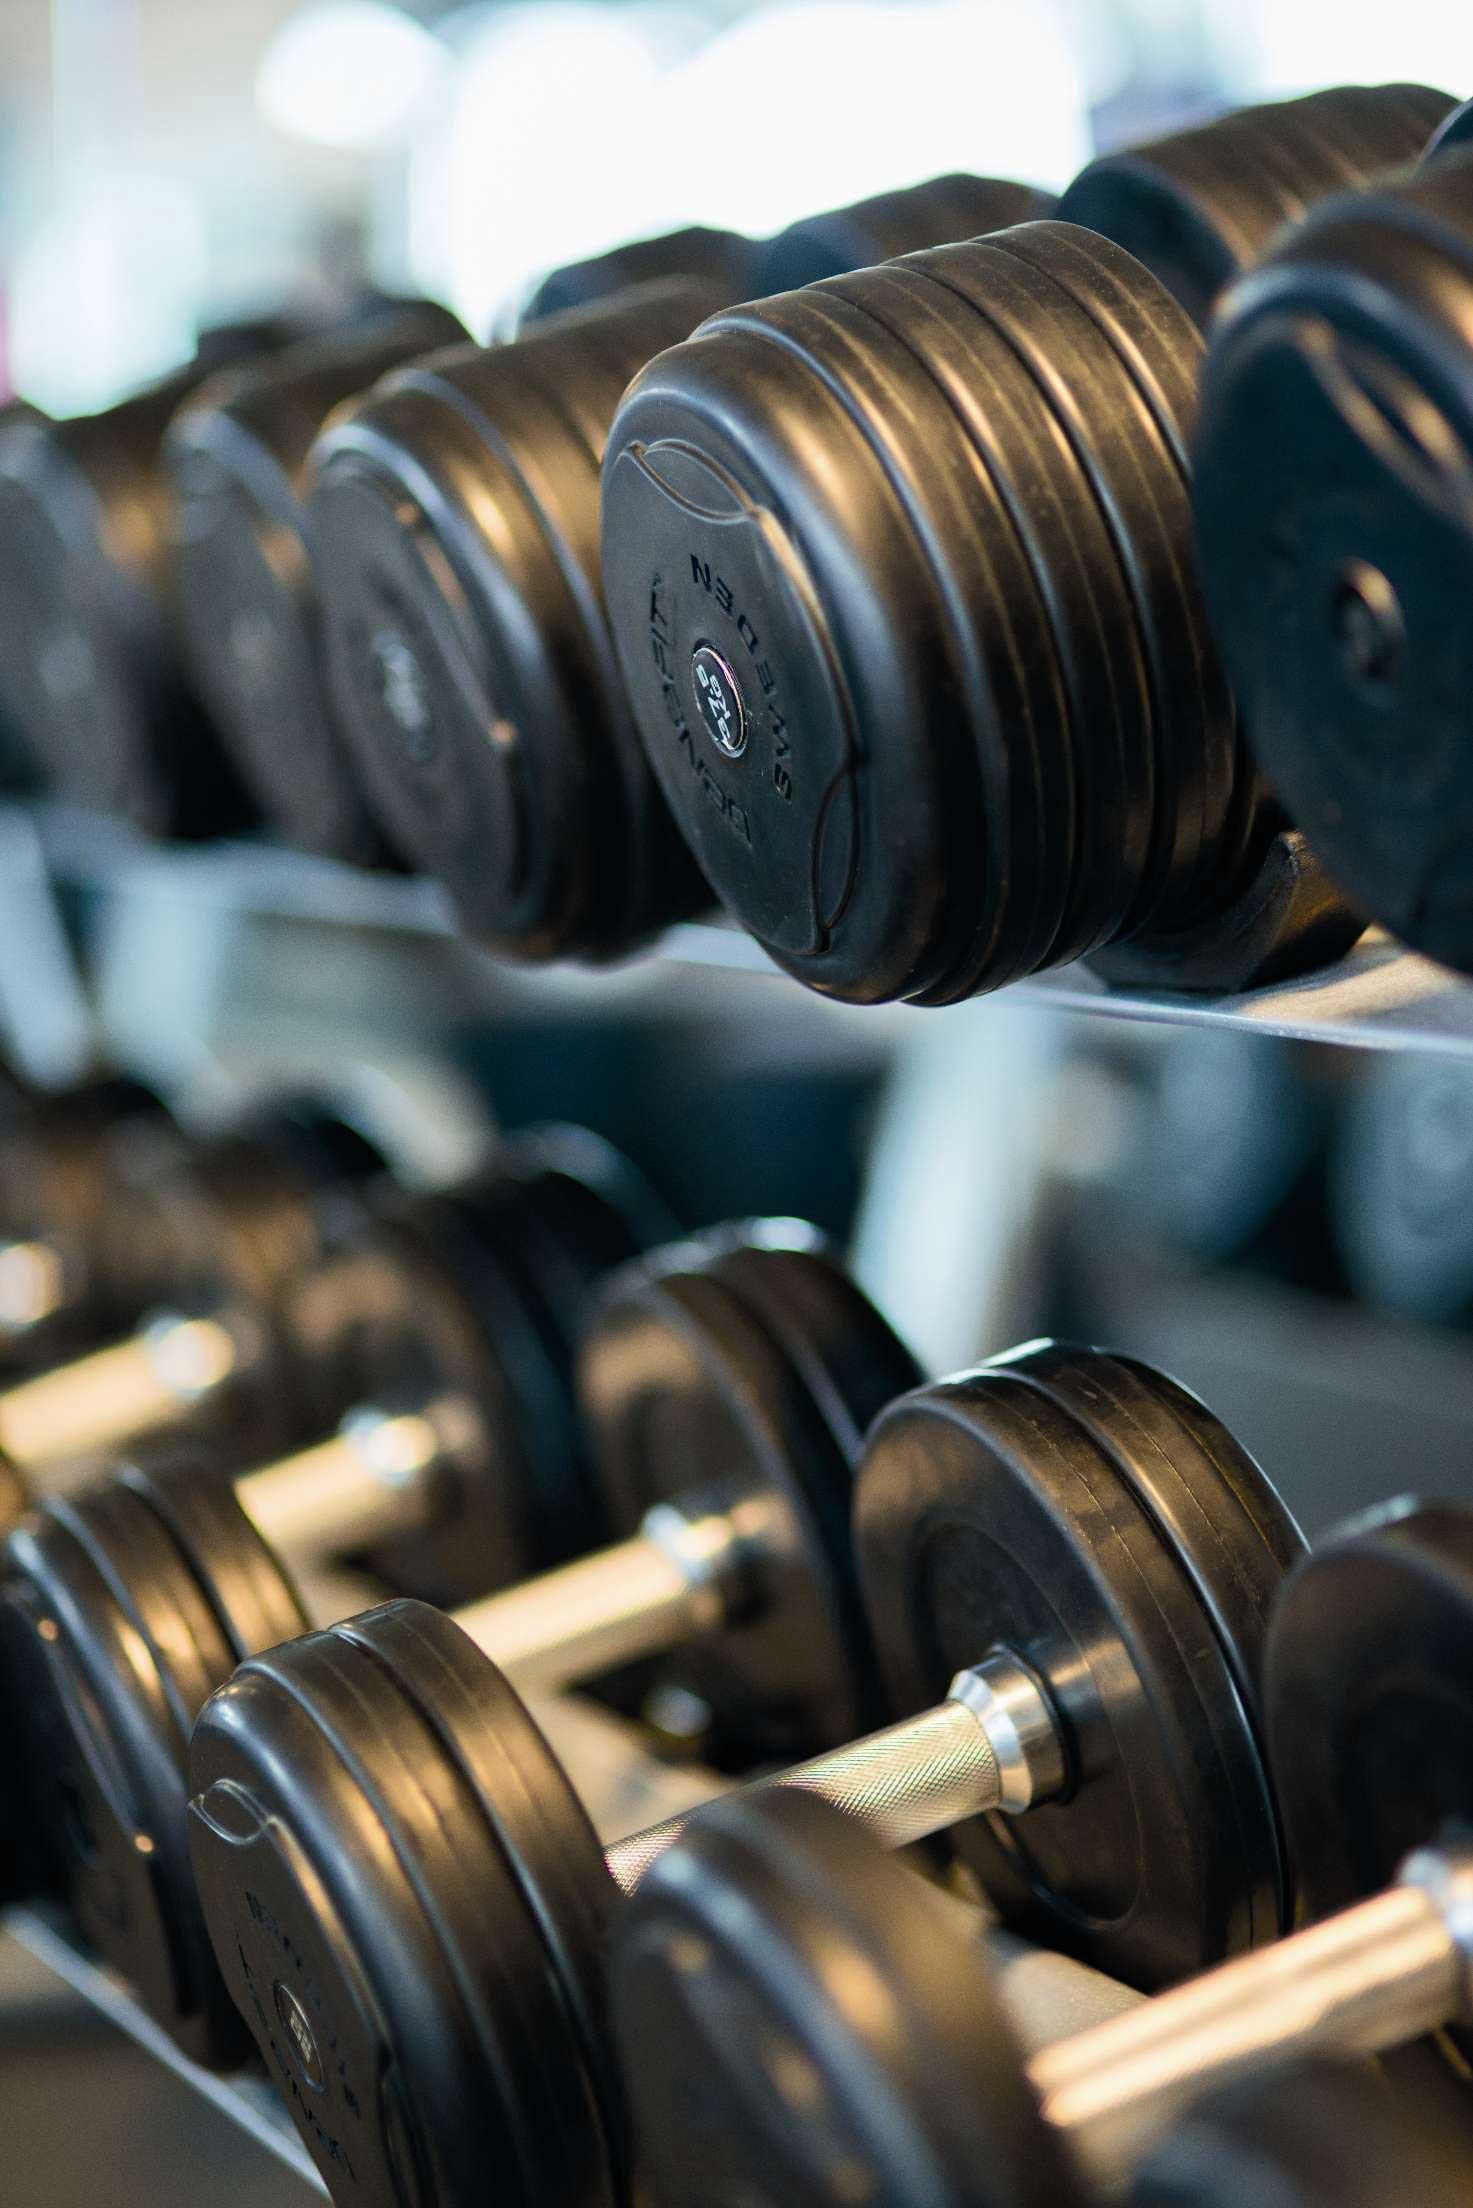 bodybuilding-close-up-dumbbells-w201.jpg